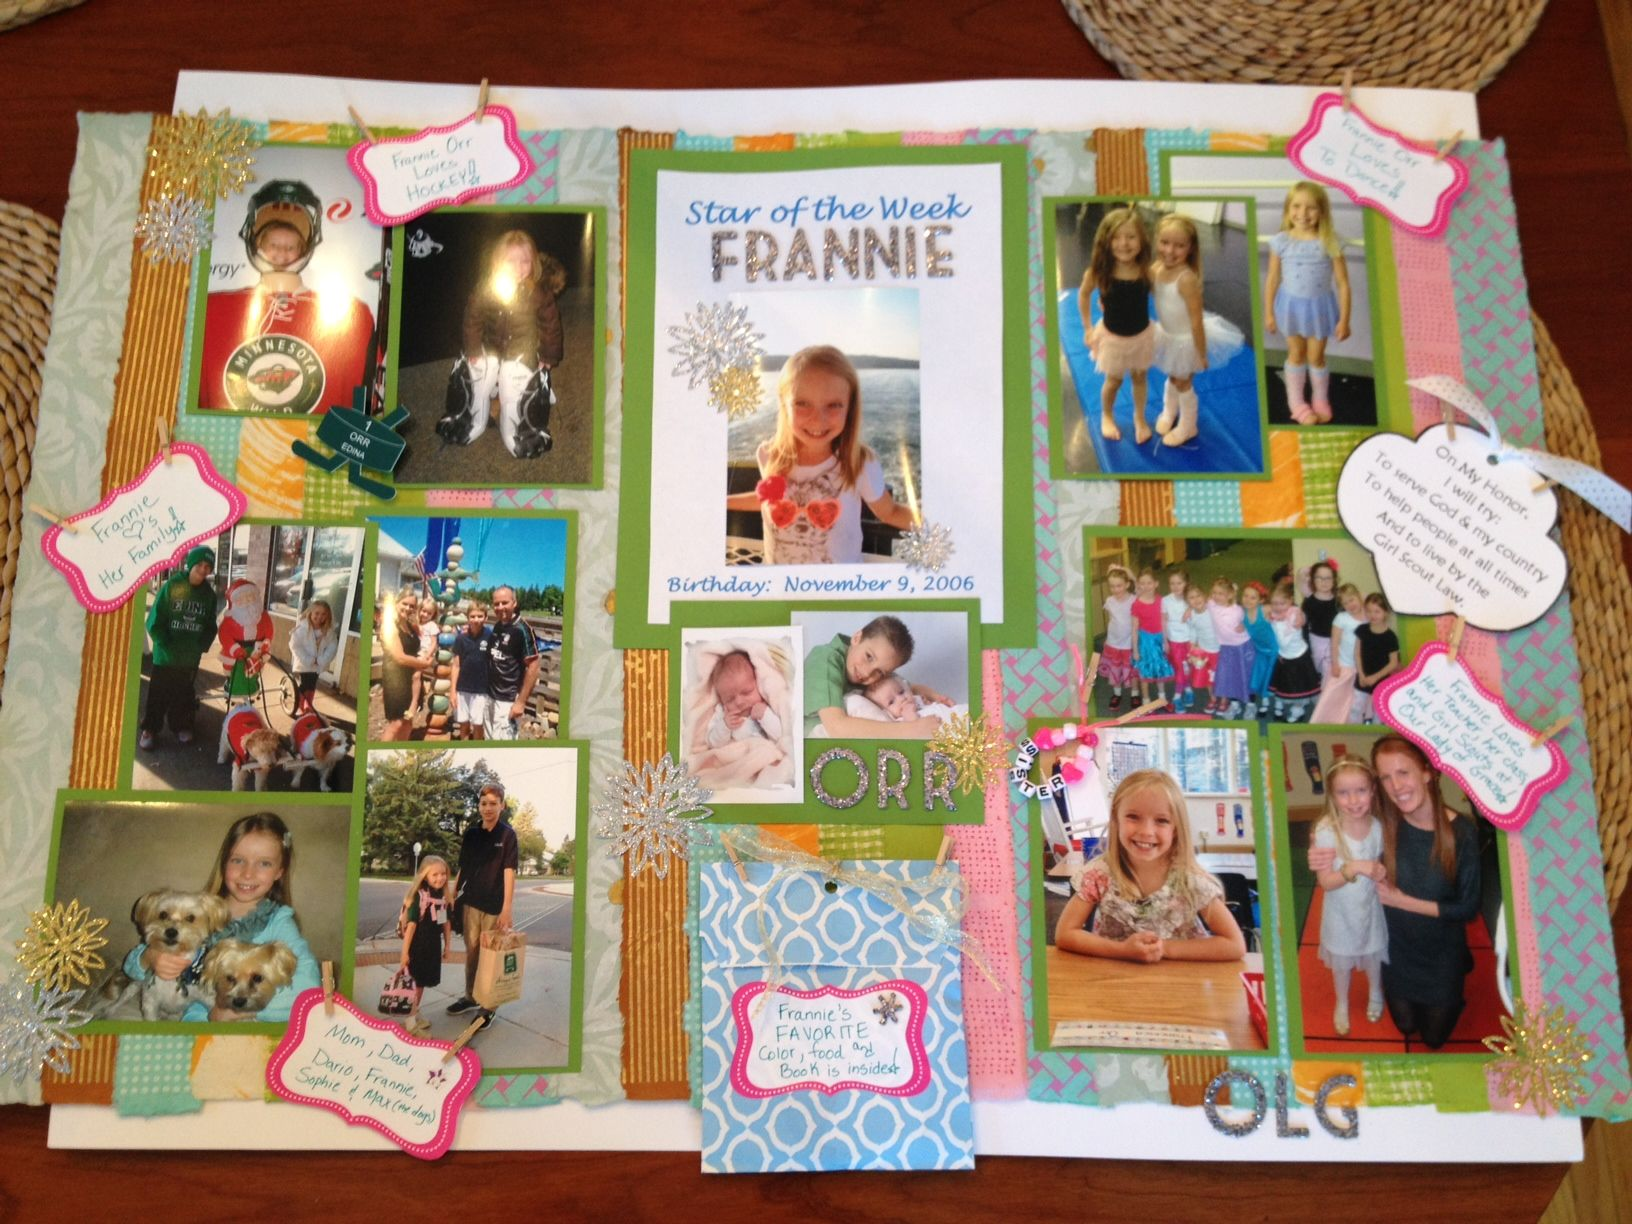 How to make scrapbook for school project - Frannie S Kindergarten Star Of The Week Board Timeline Projectschool Postersschool Projectsschool Ideaskids